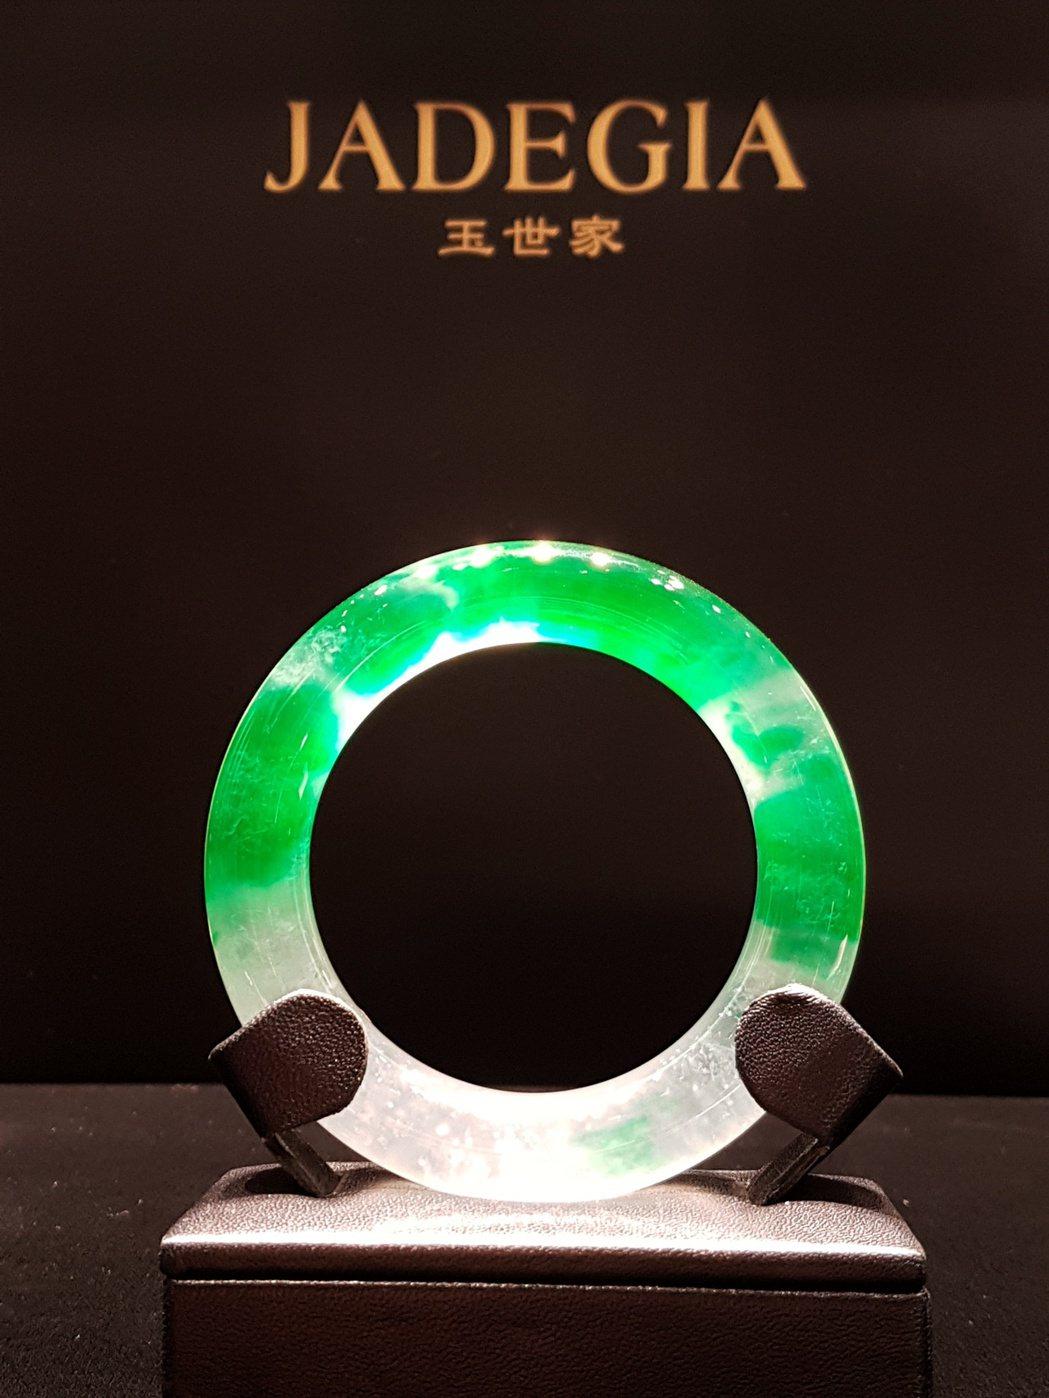 JADEGIA 玉世家 101 形象店開幕,天心性感展示珠寶。記者陳立凱/攝影